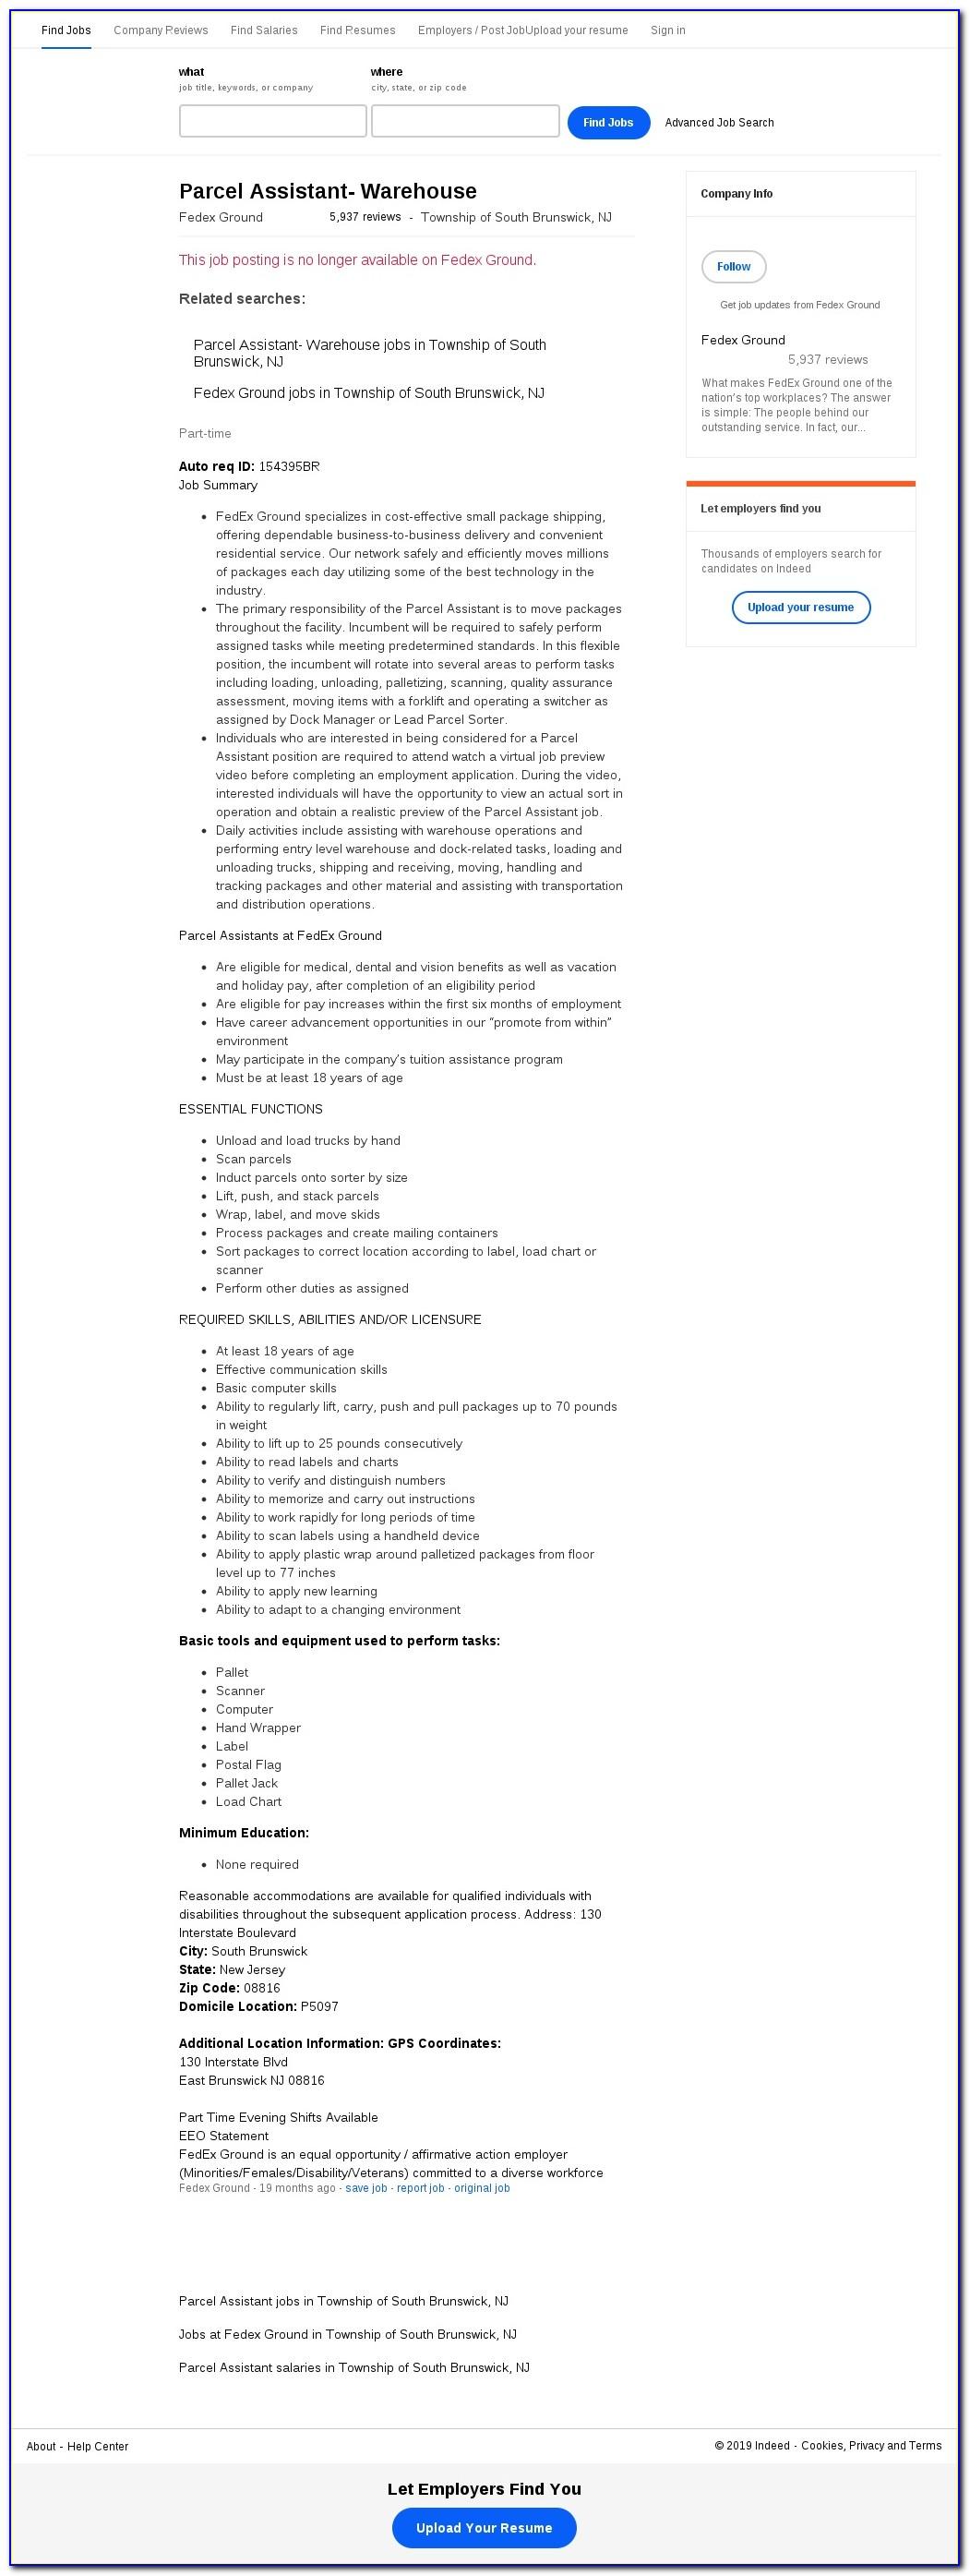 Fedex Ground Package Handler Job Application